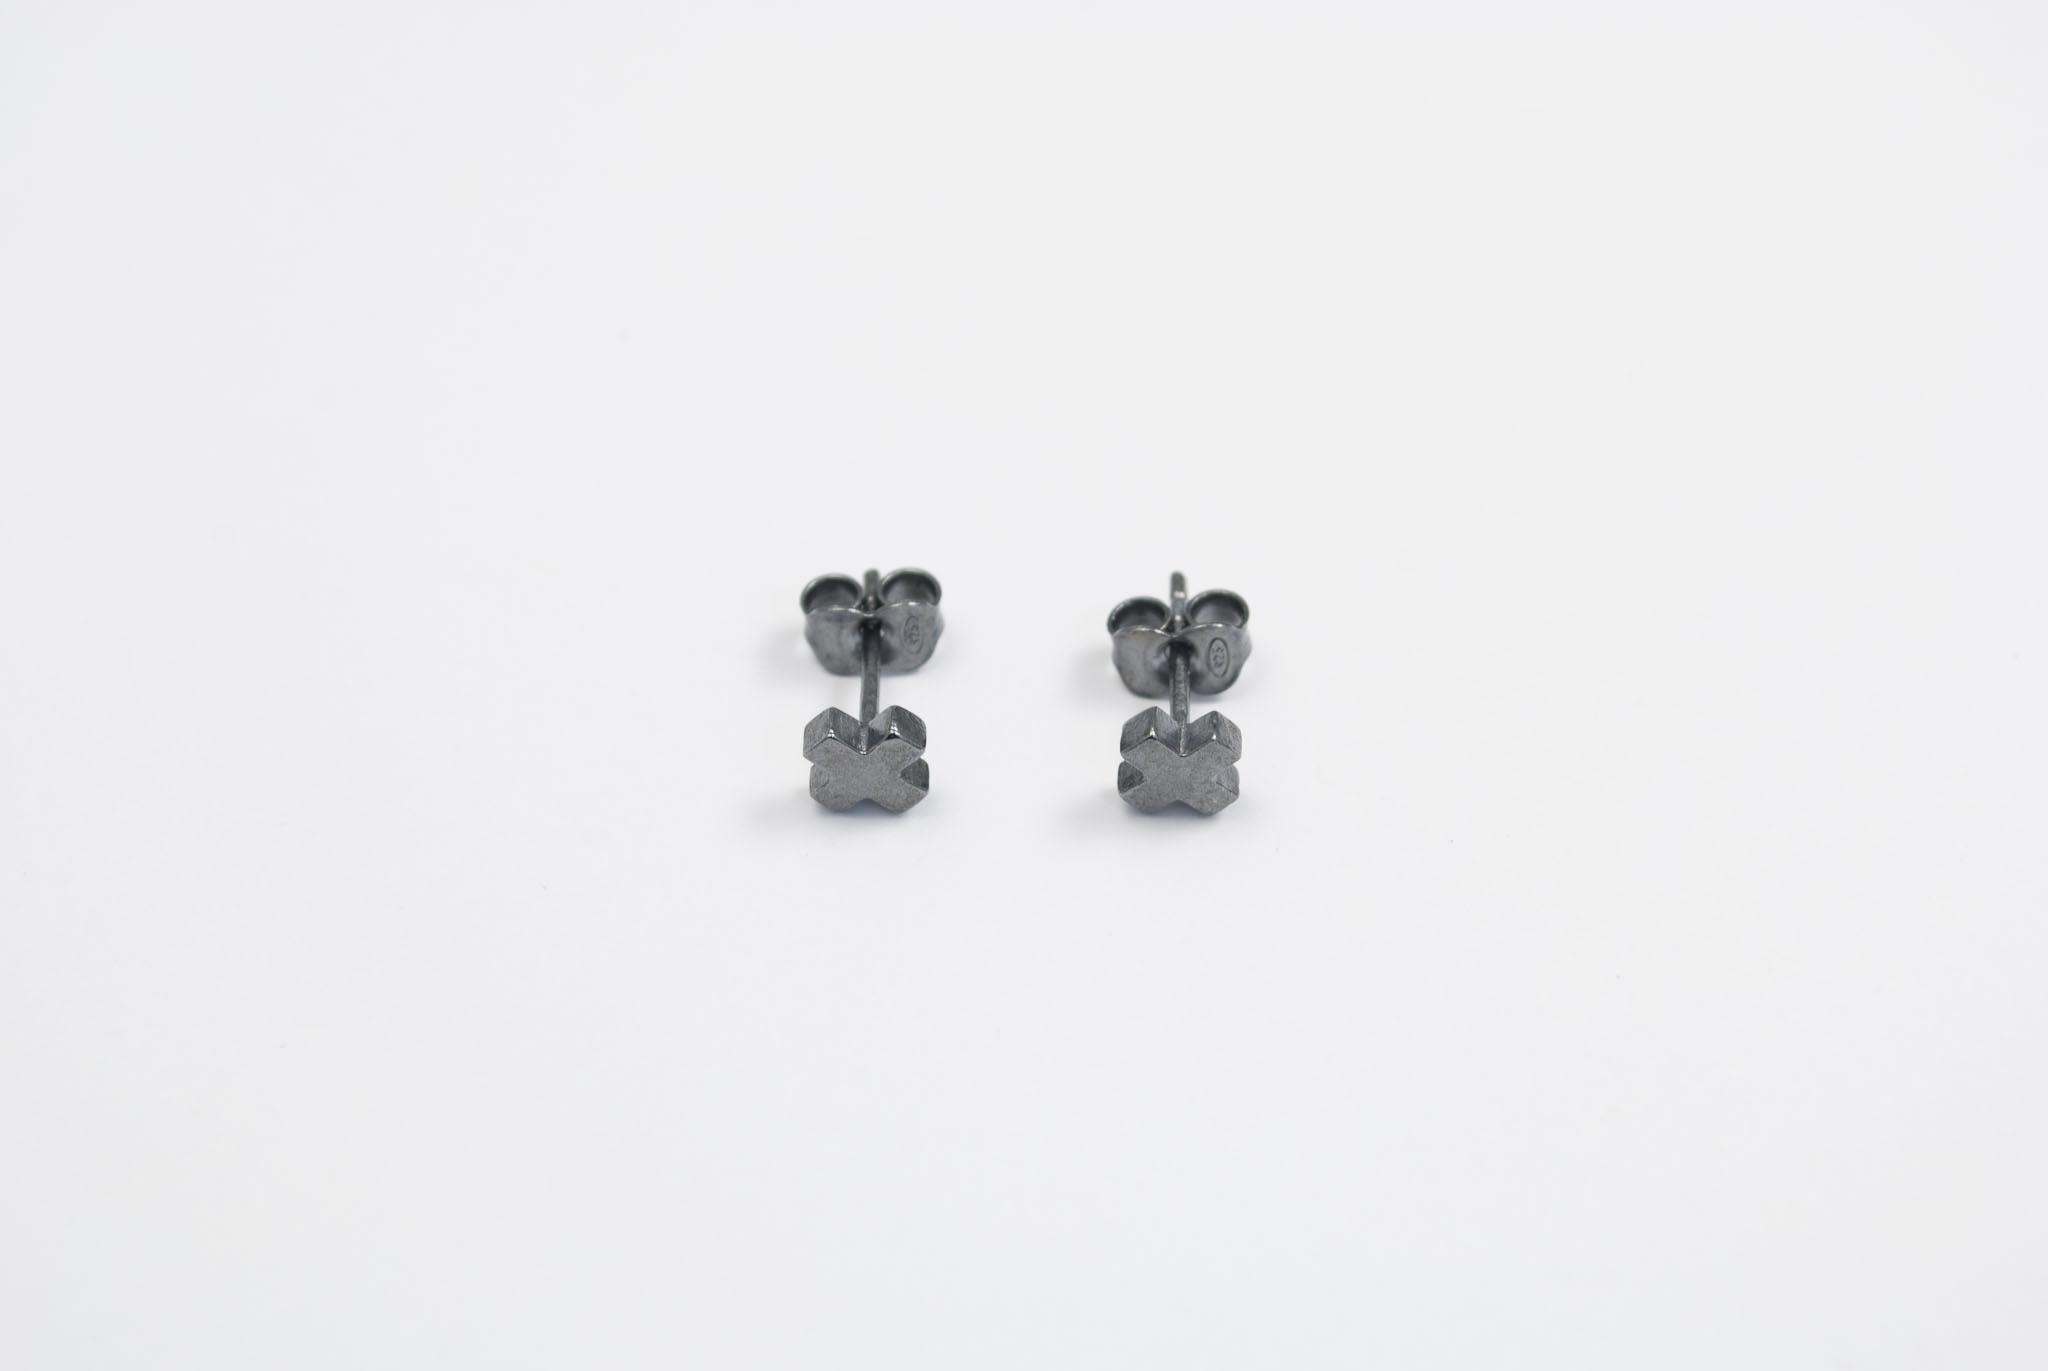 Silver earrings GRAD X - black patina